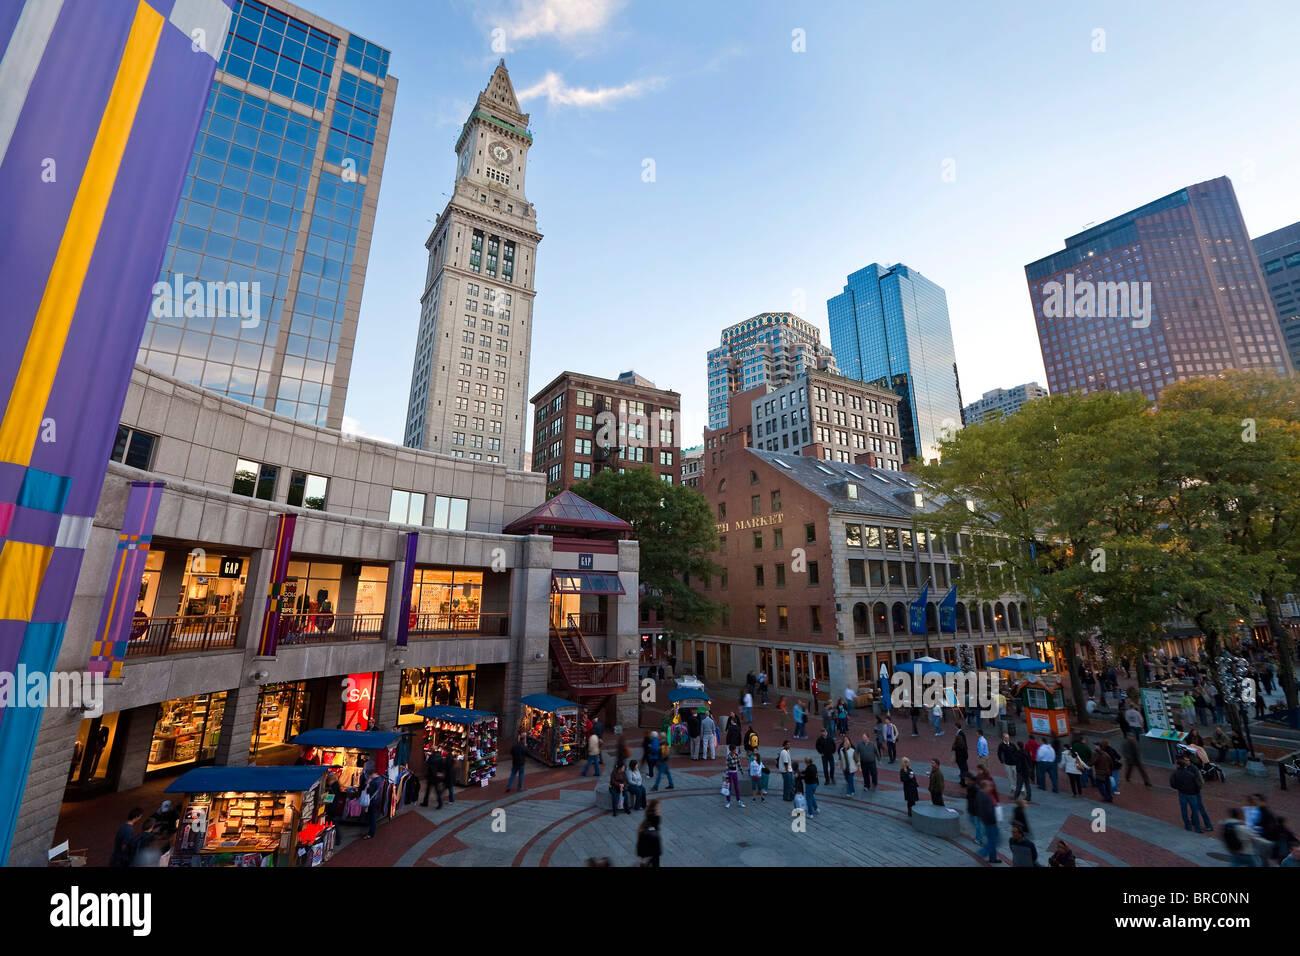 Quincy Market, Boston, Massachusetts, New England, USA - Stock Image